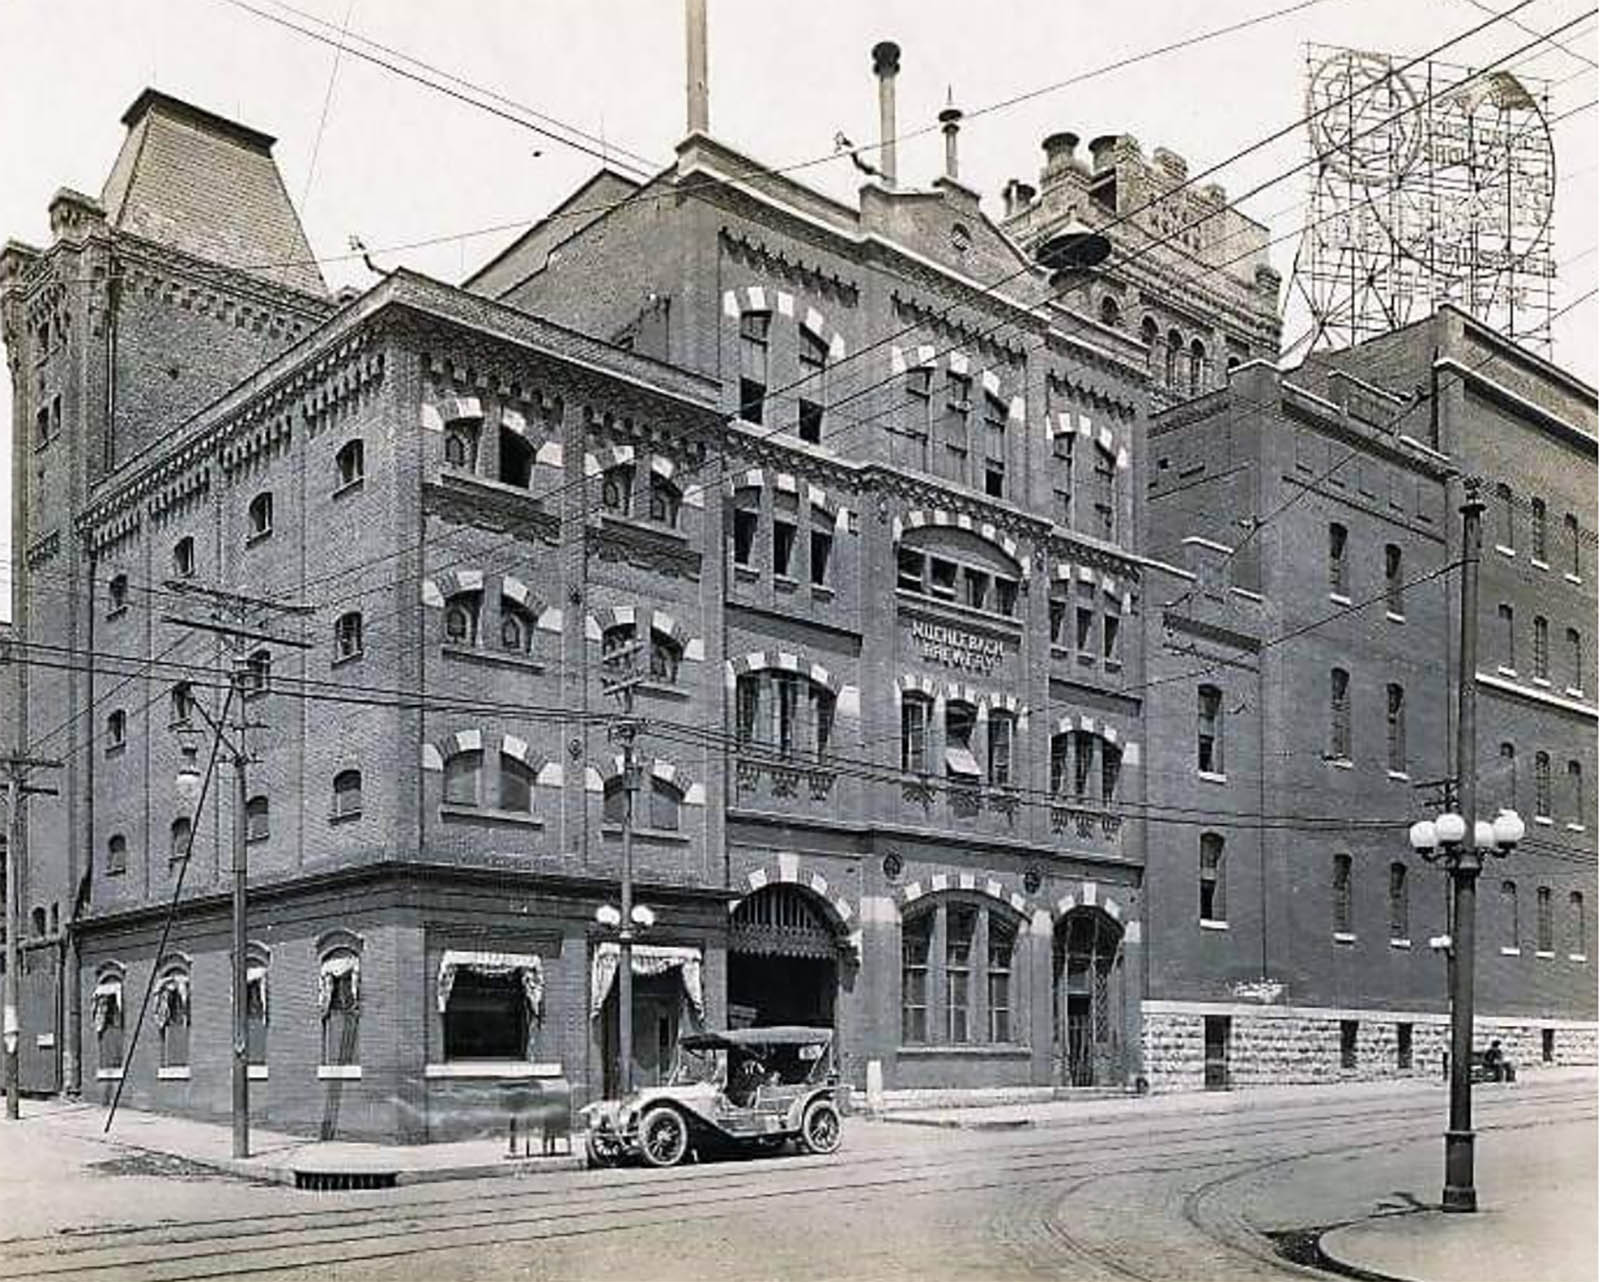 Muehlebach Brewery